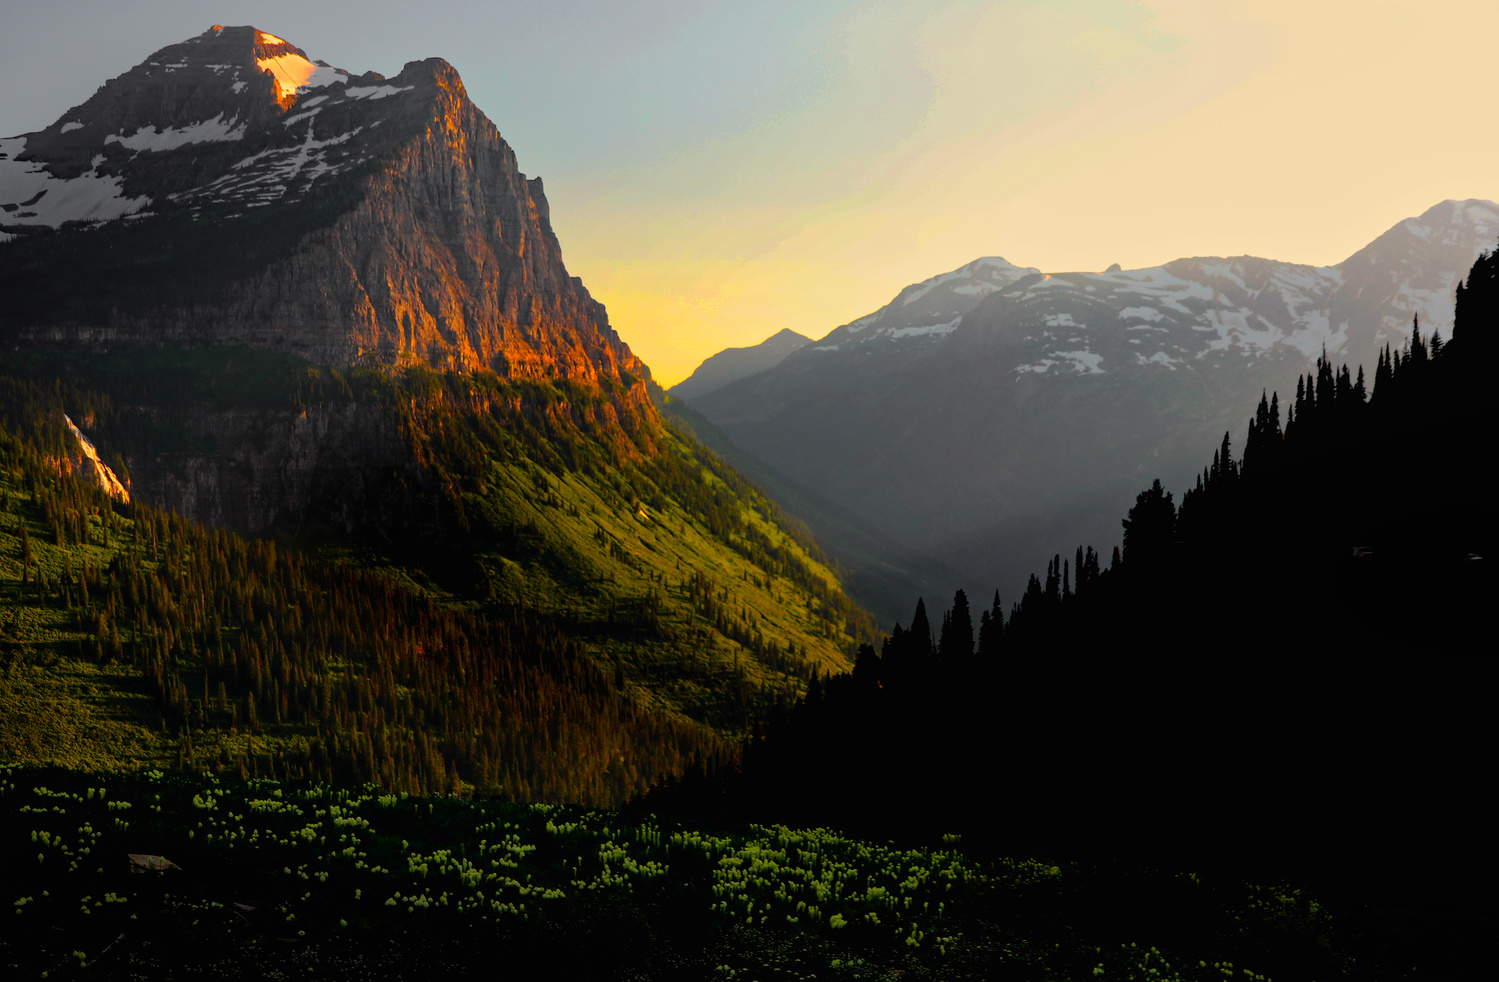 Sunset-Glacier National Park by J. Daniel Jenkins